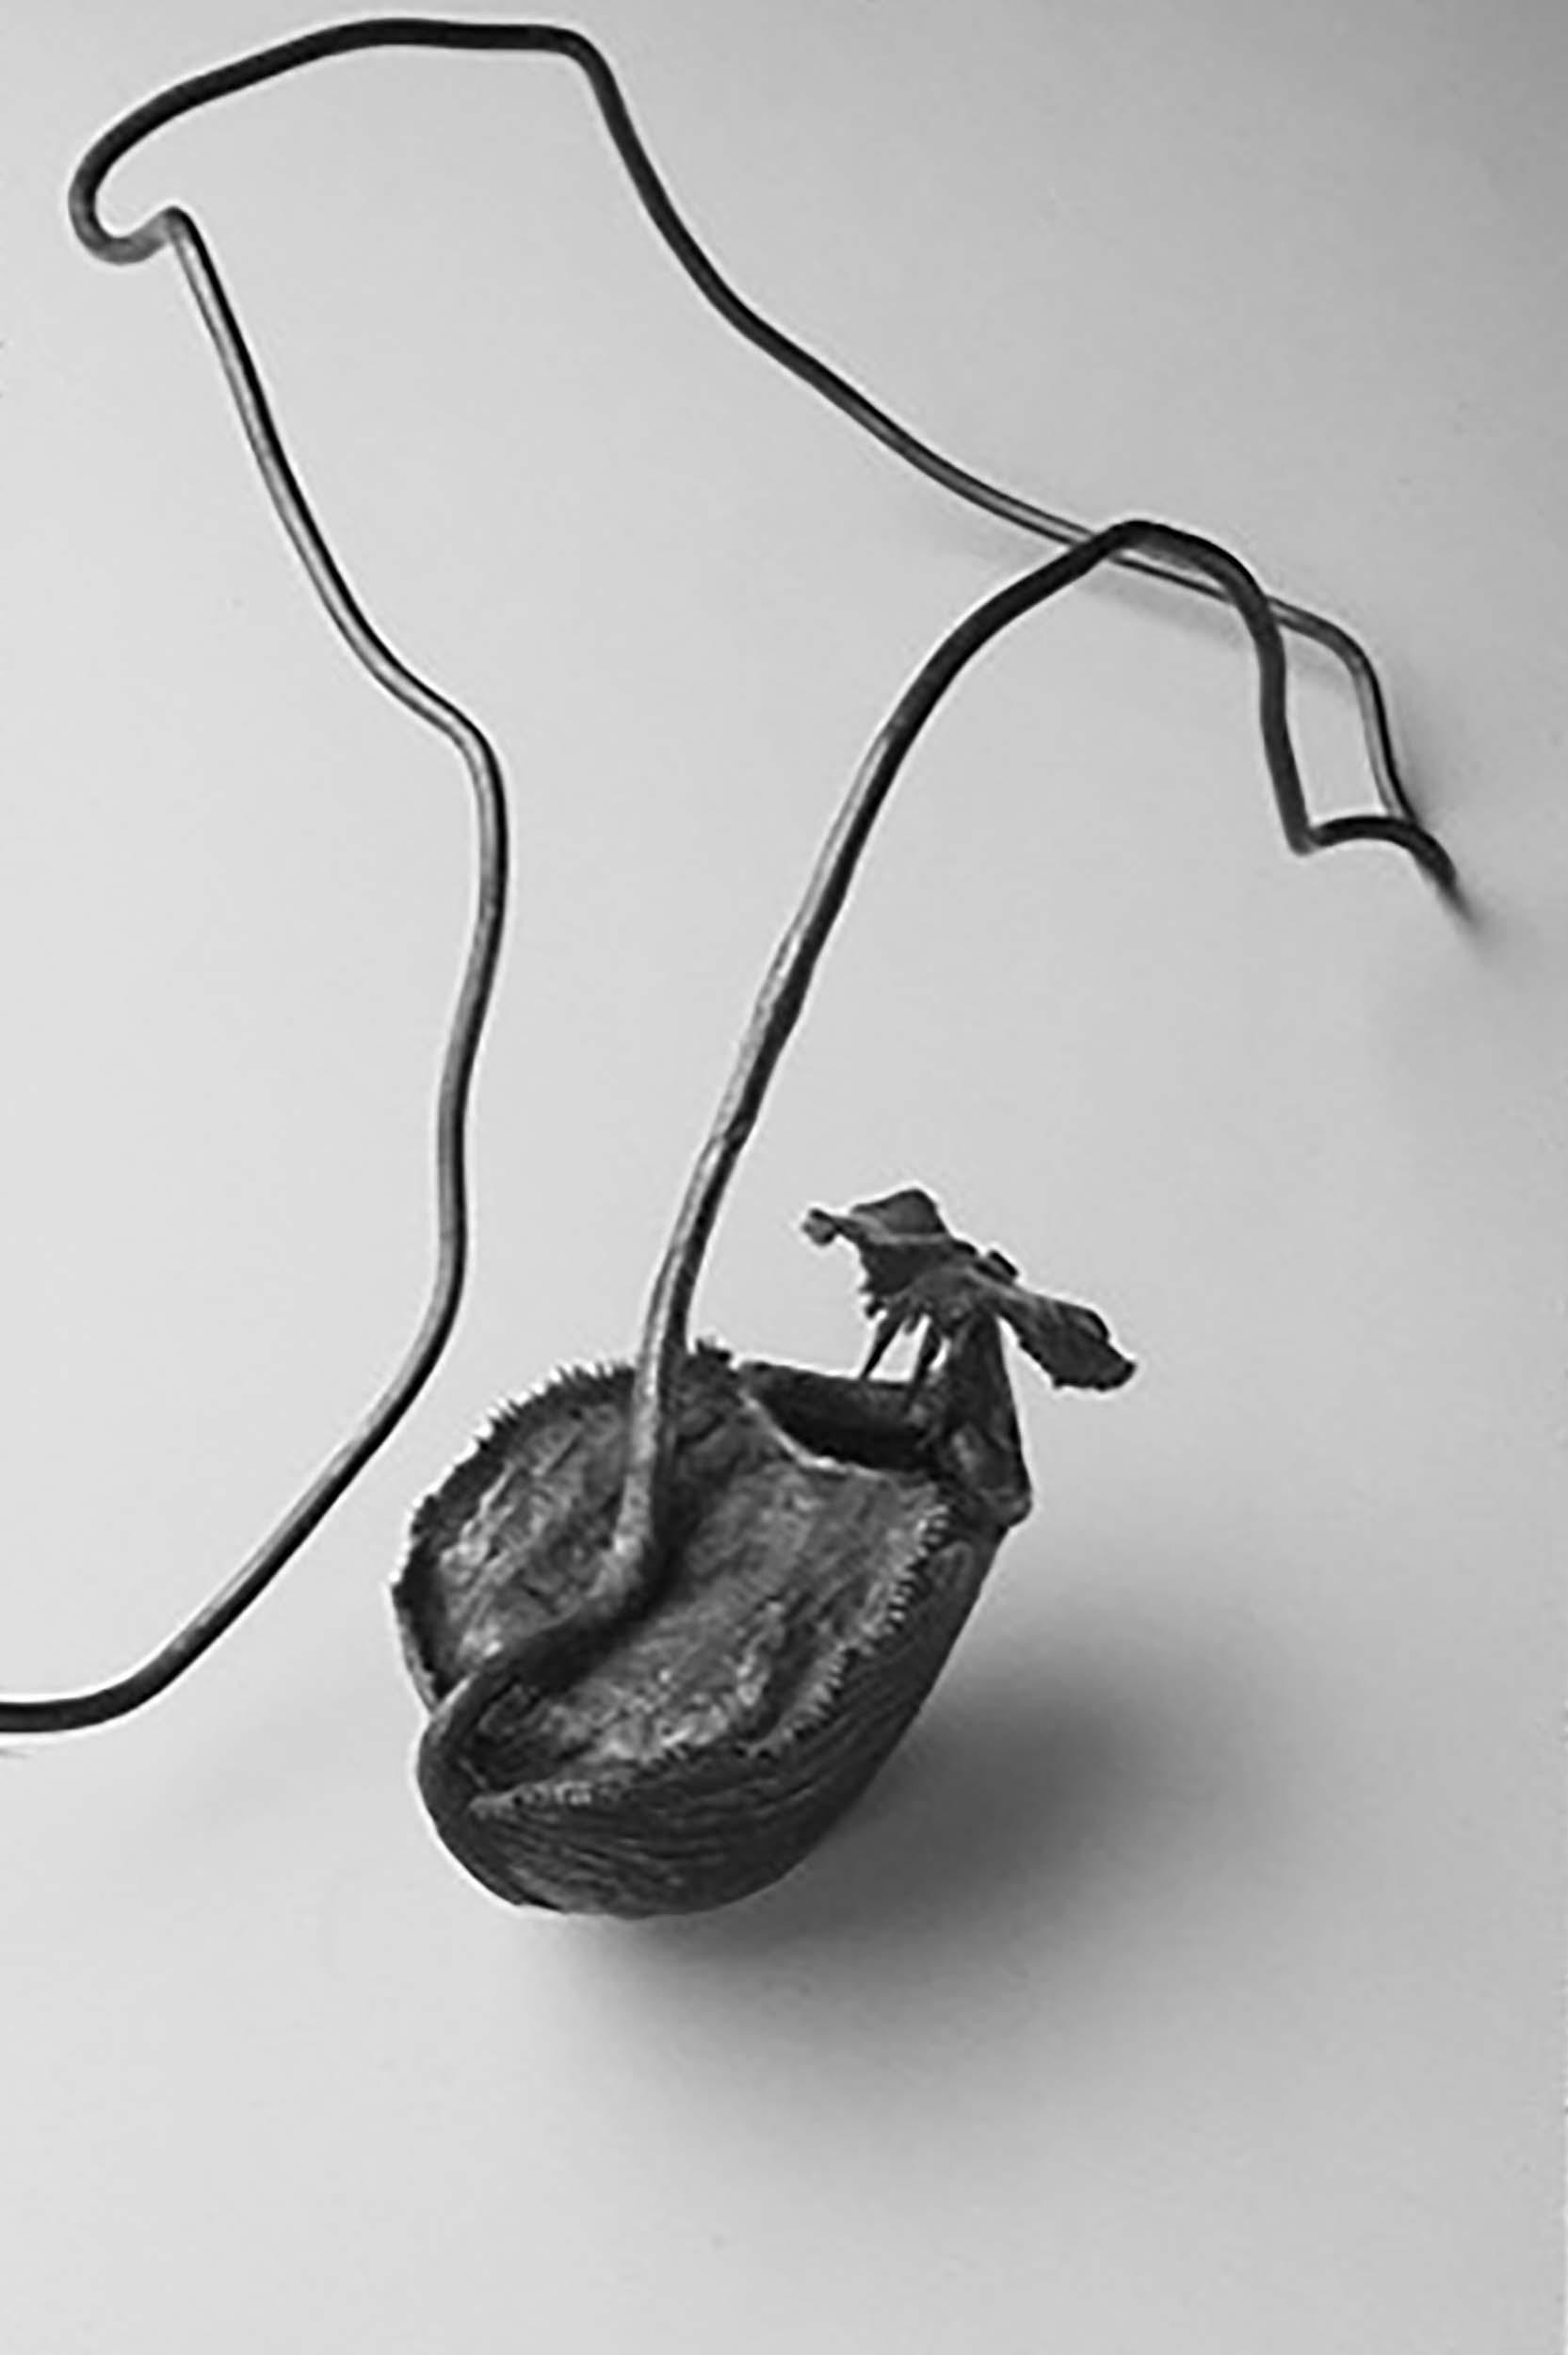 Nepenthes Neckpiece